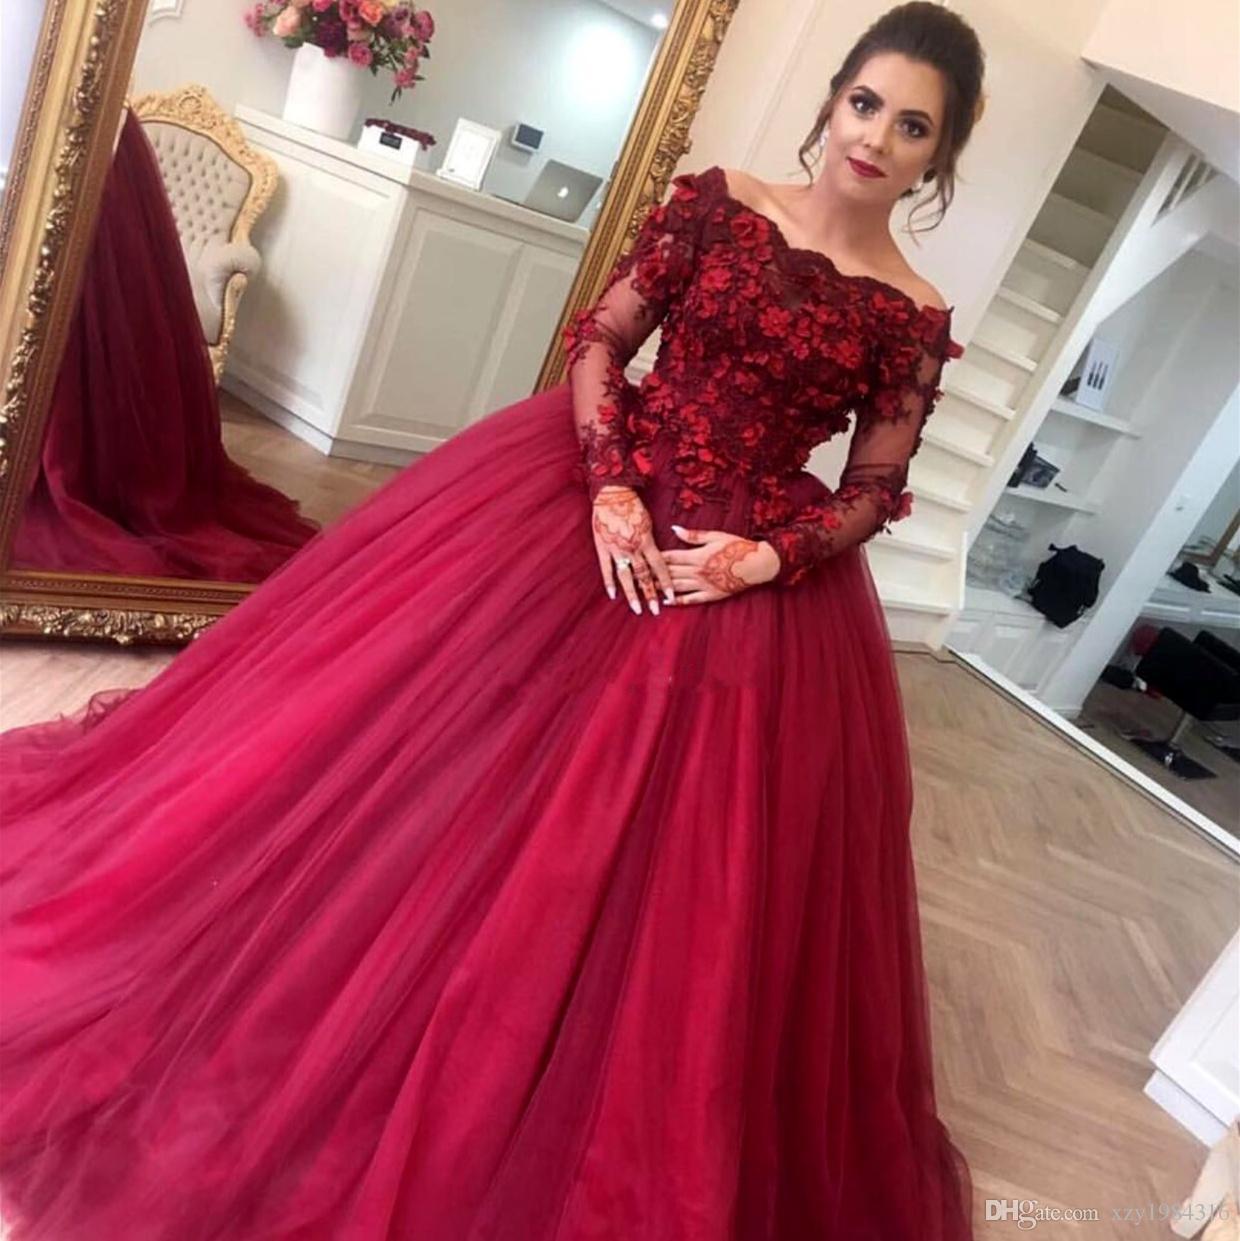 Vintage Burgundy Prom Ball Gowns Off The Shoulder Floral Applique